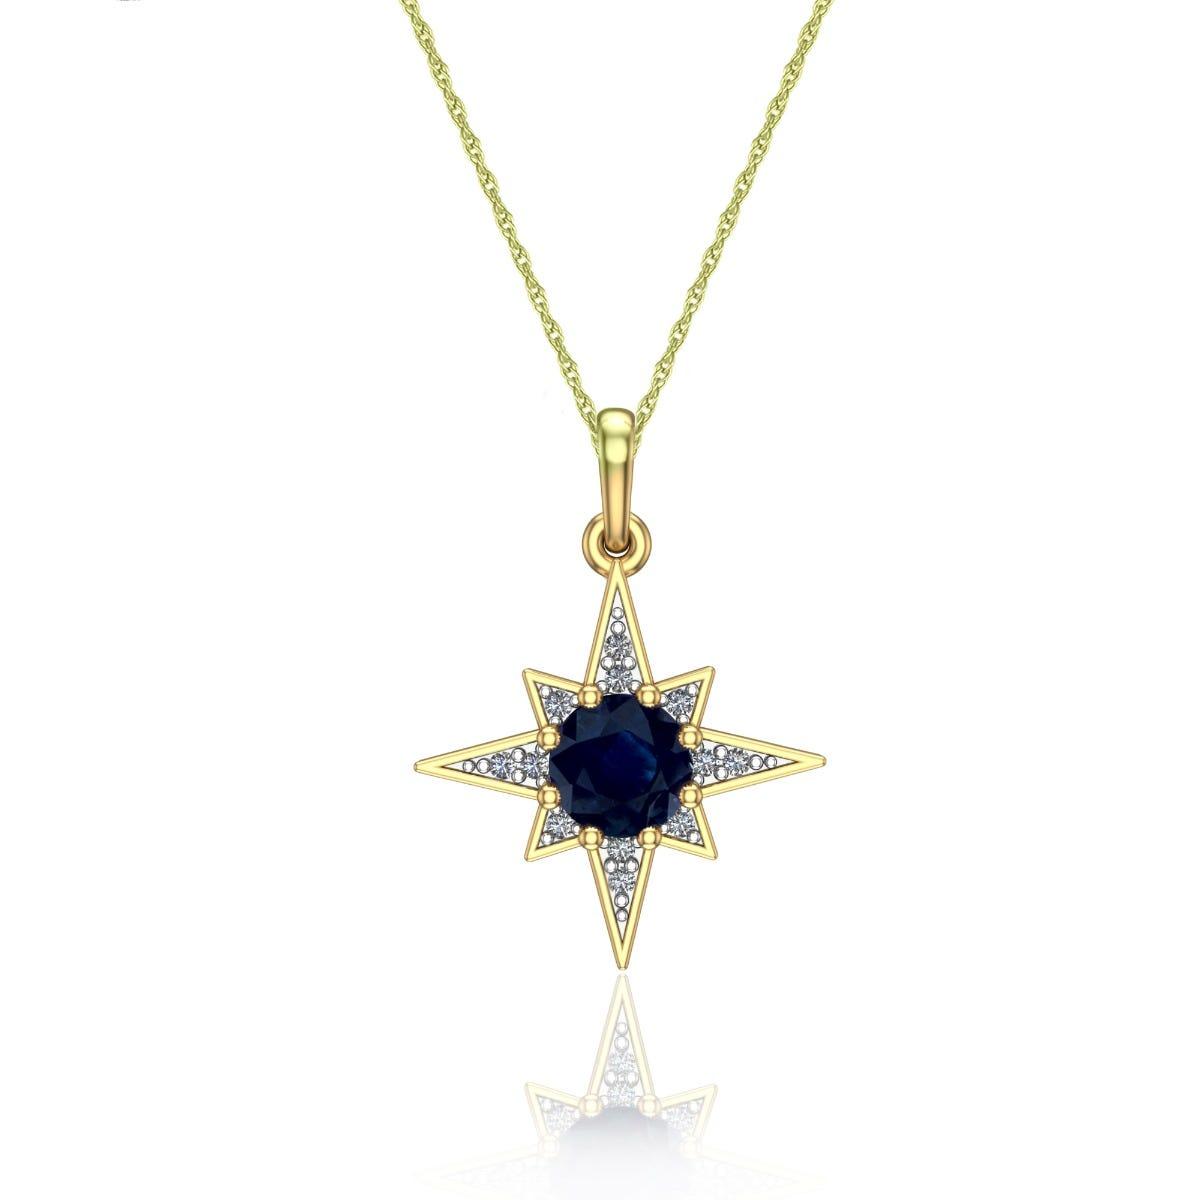 Brilliant-Cut Sapphire & Diamond Star Pendant in 10k Yellow Gold